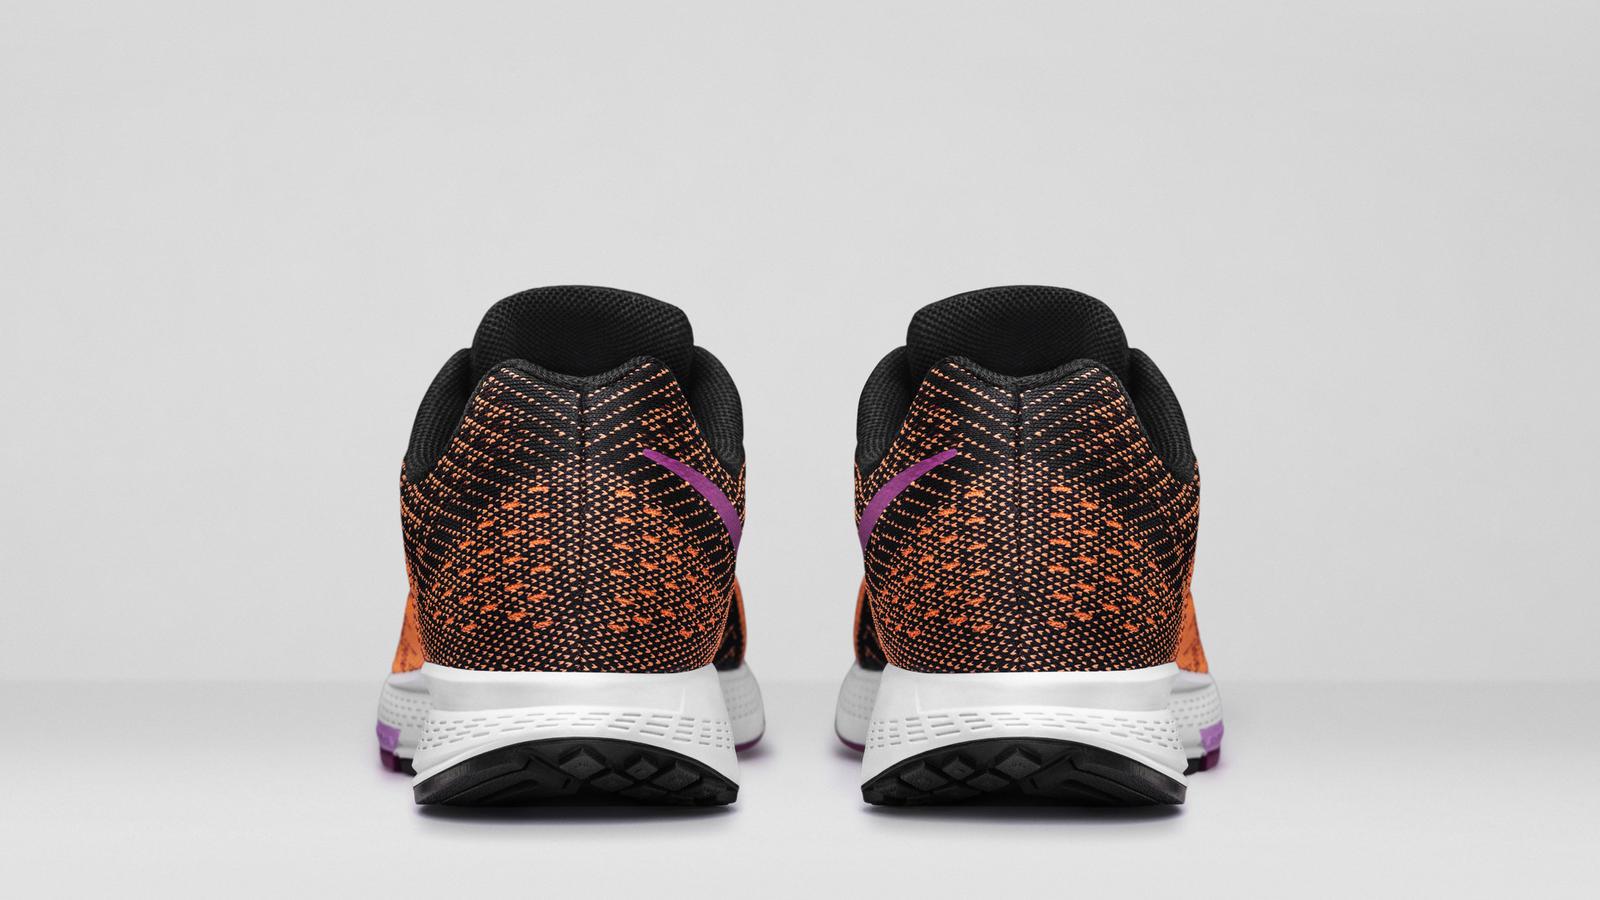 Nike Air Zoom Elite 8: Low, Sleek, Fast and Light - Nike News